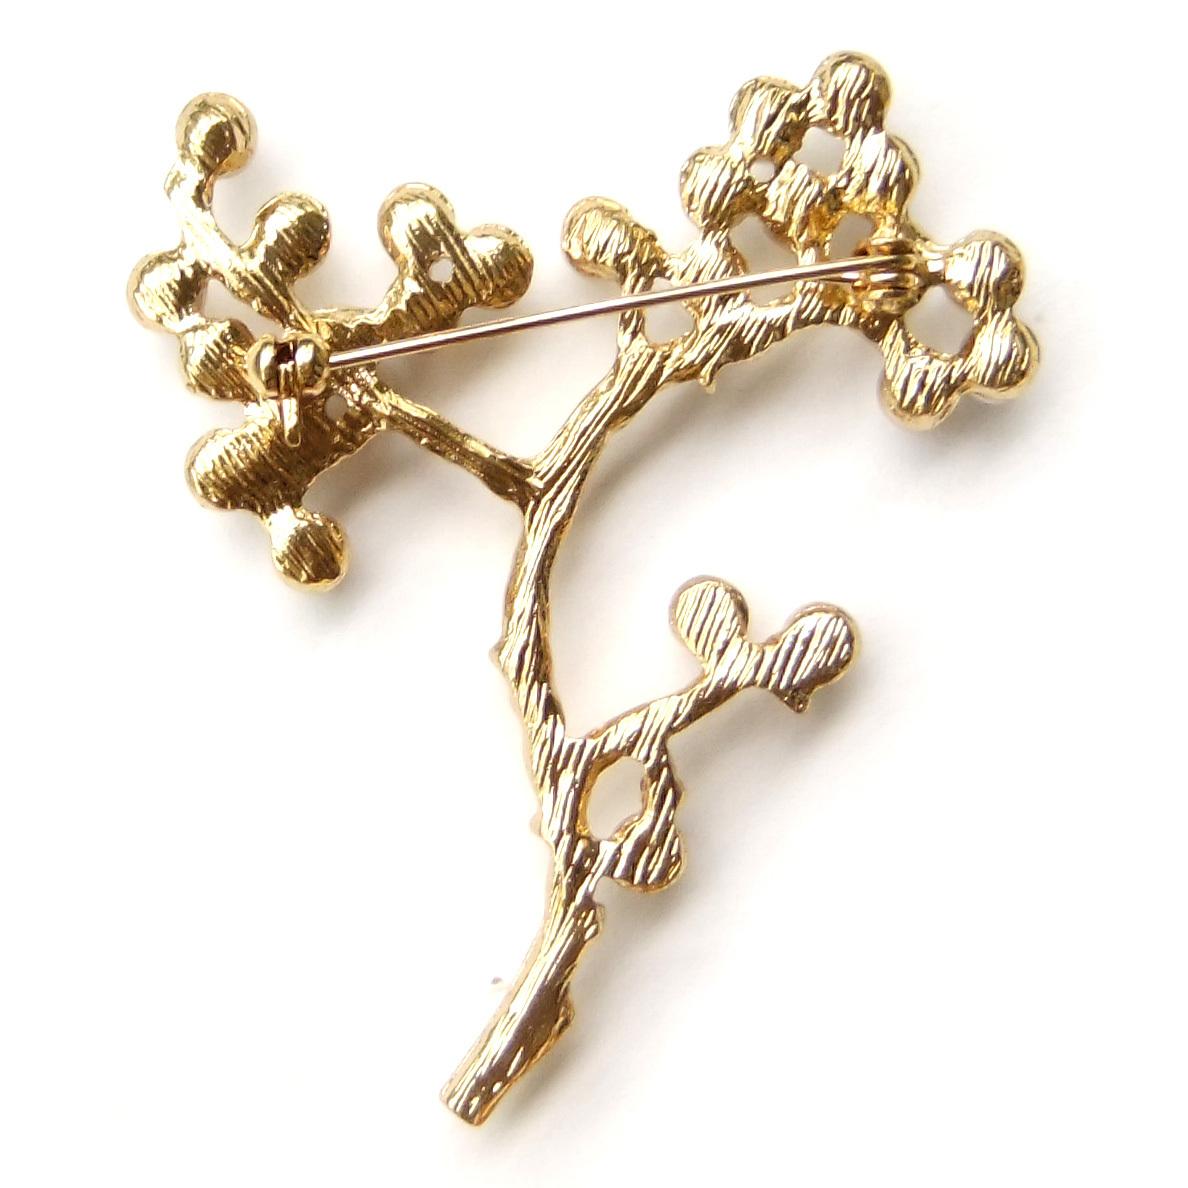 Tree Branch White Flower Fruit Pearl Vintage Elegant Exquisite Simple Brooch Pin